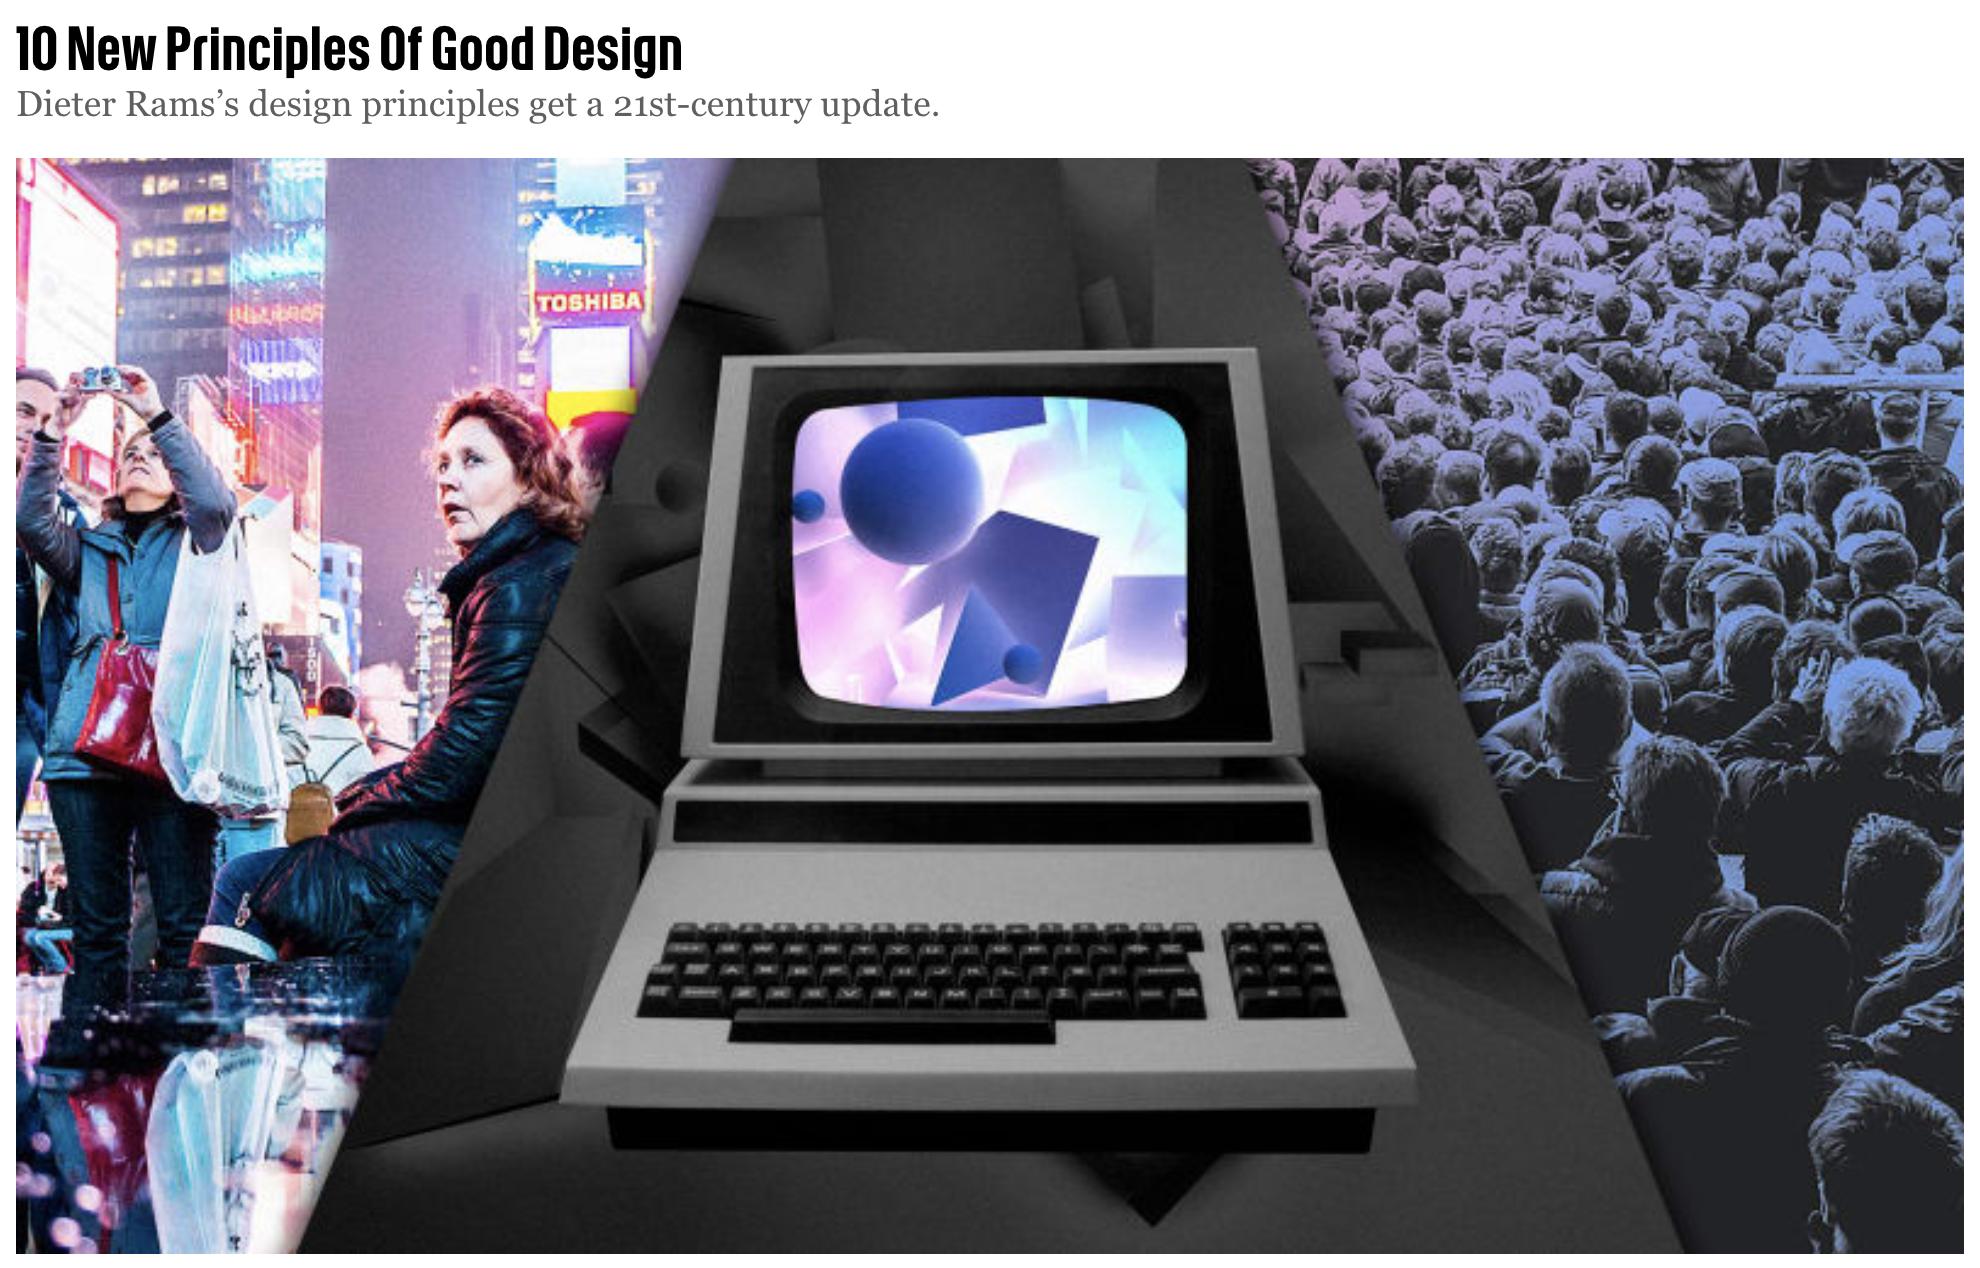 10 New Principles Of Good Design